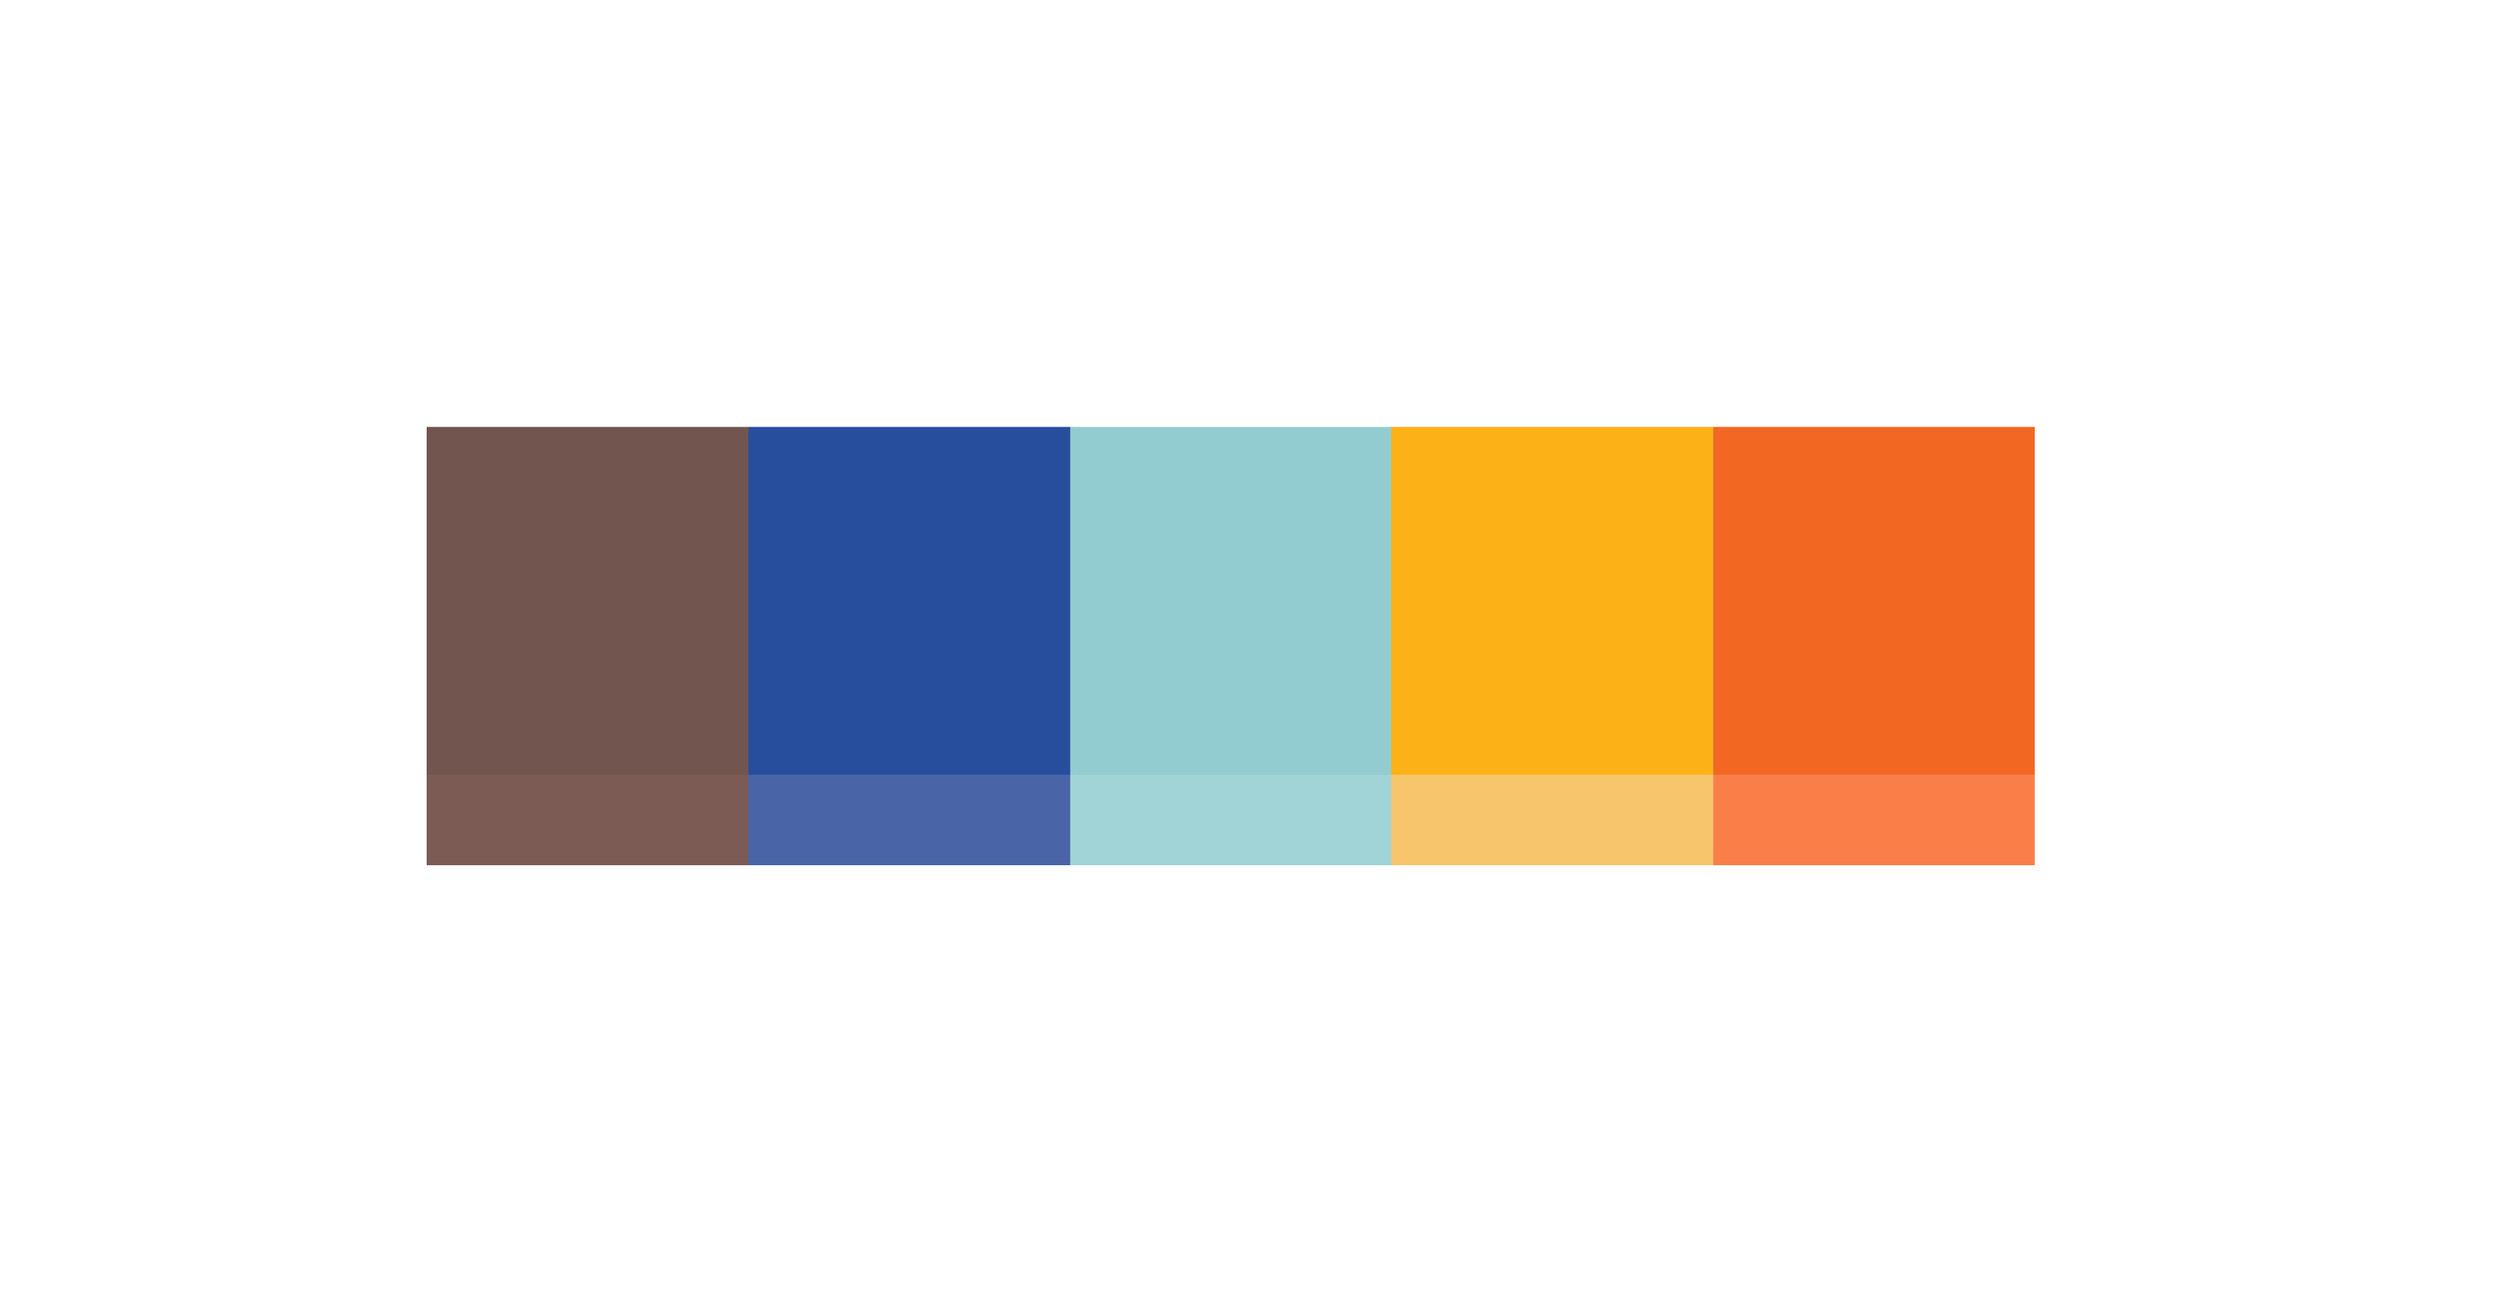 LynseyCreative_FluidColdBrew_Portfolio_colorpalette.jpg